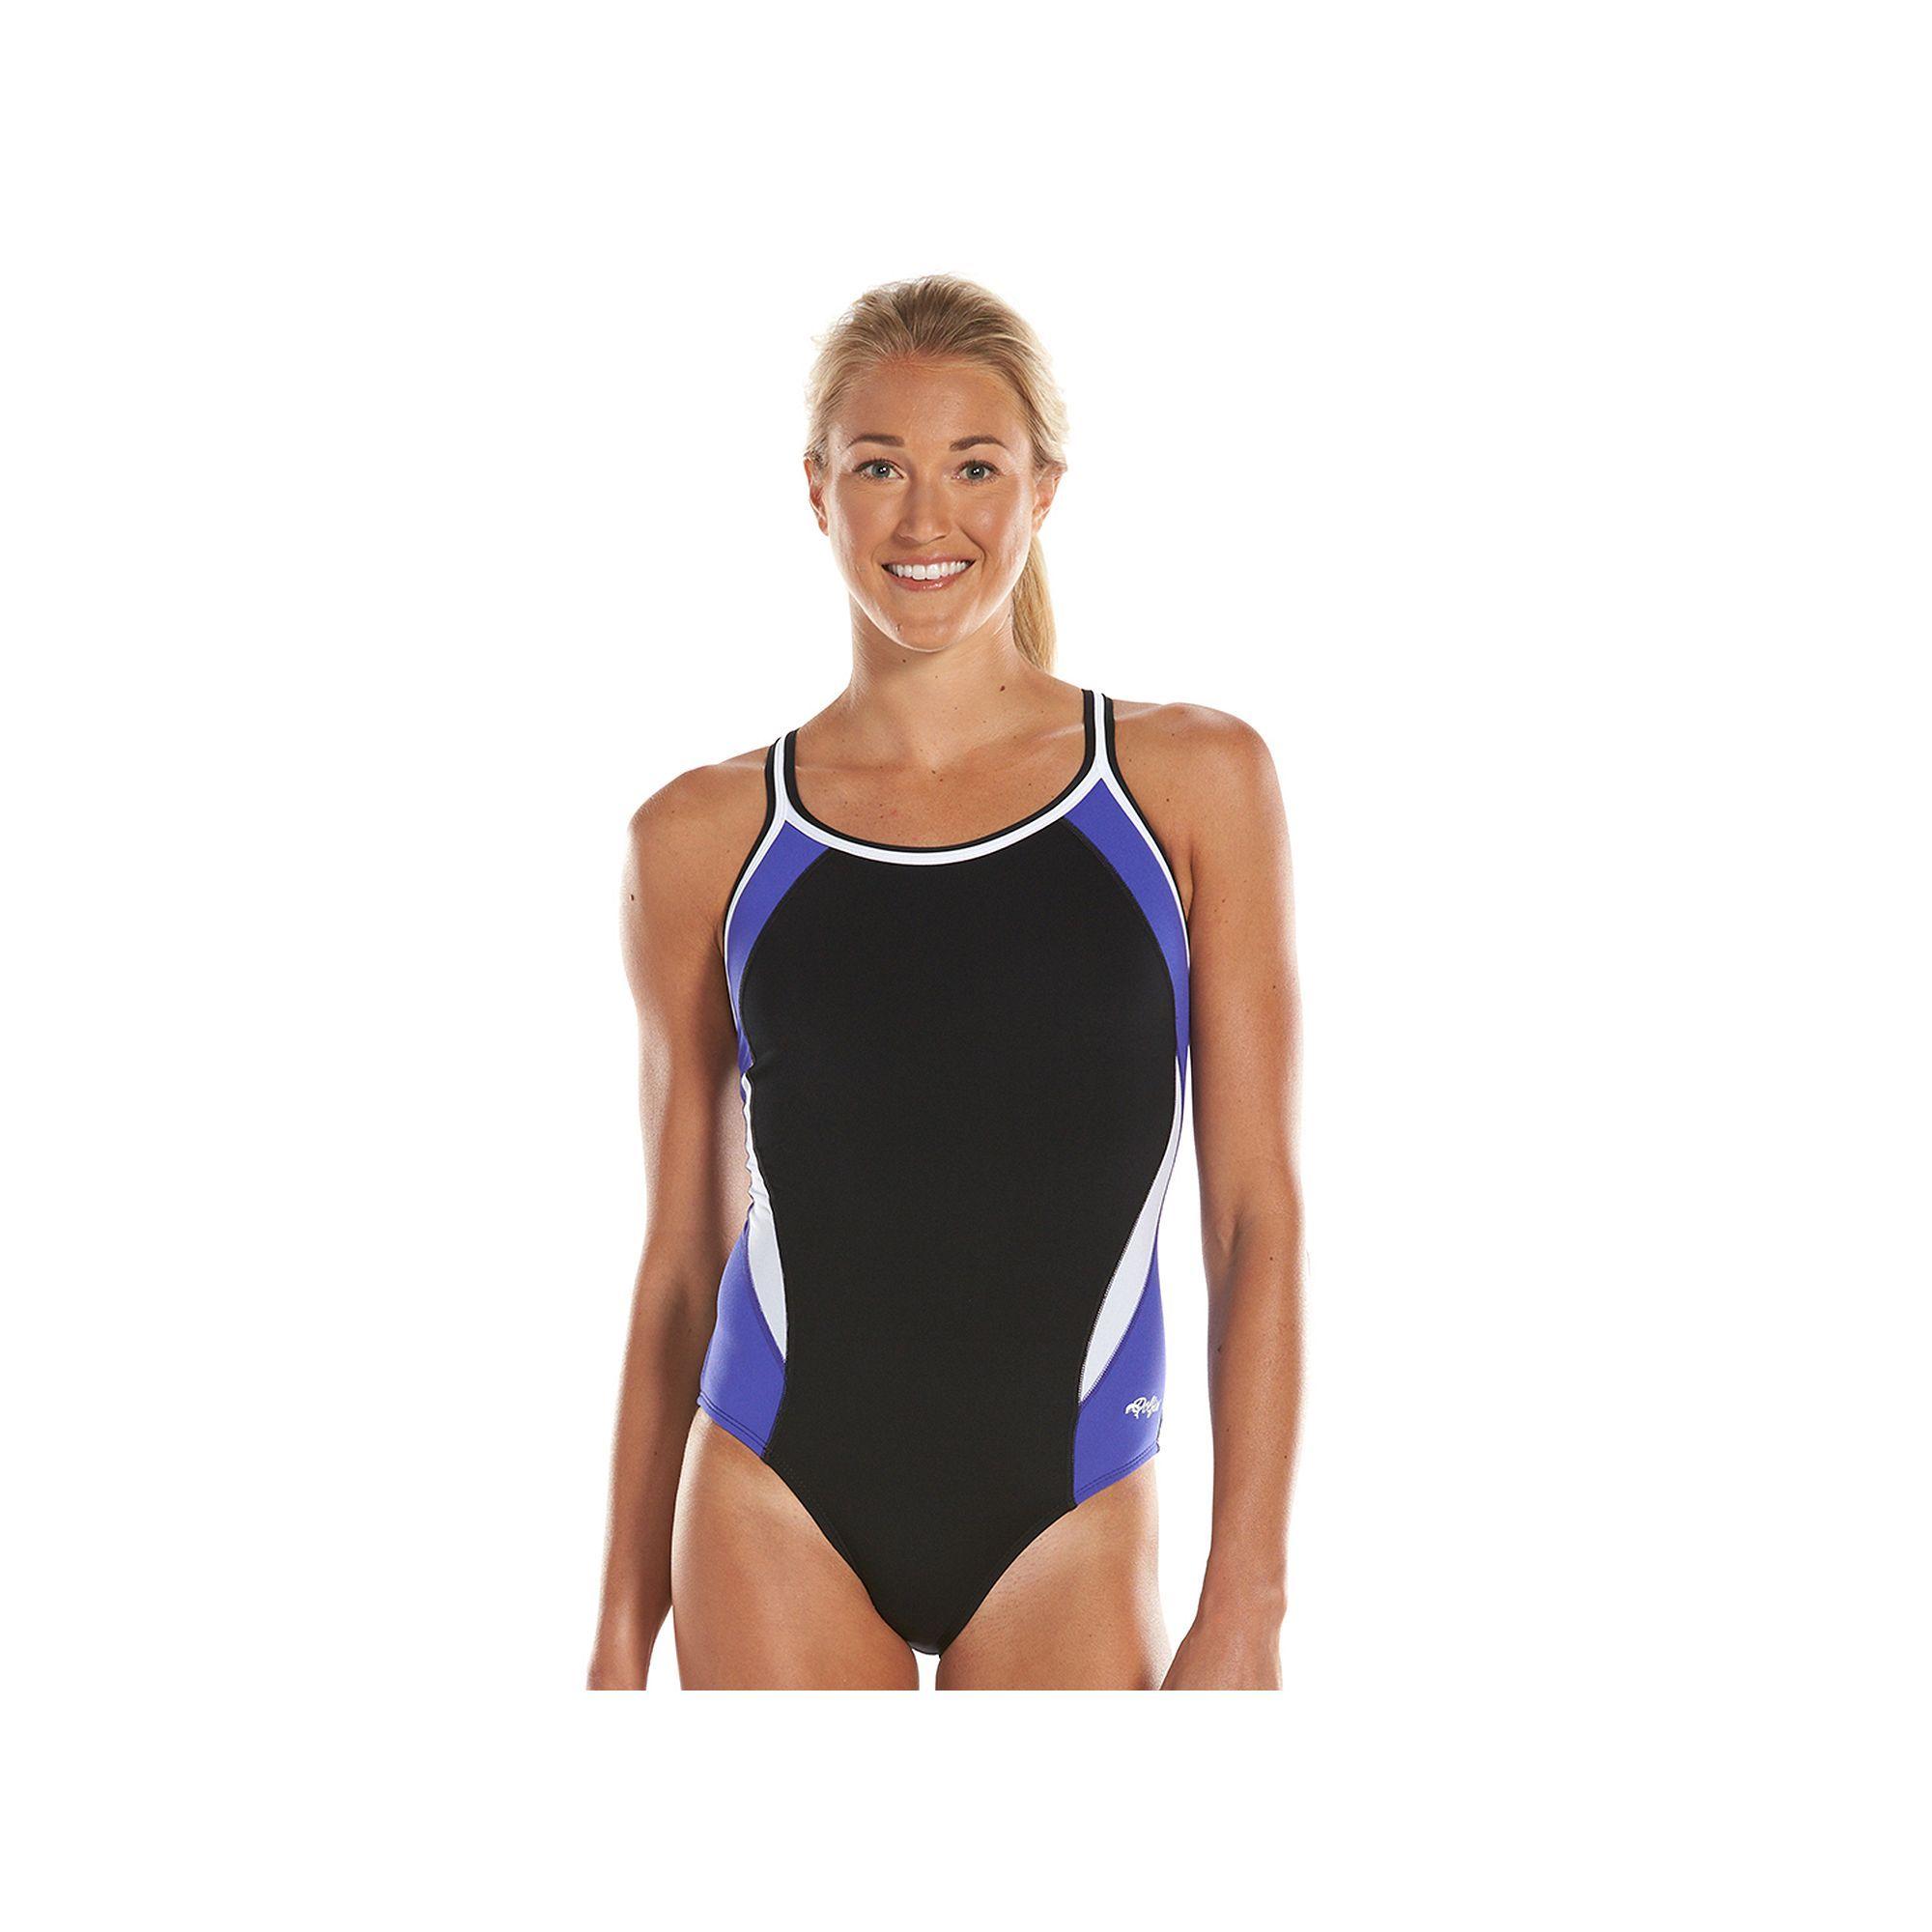 5593e5df2b Women's Dolfin Team Colorblock DBX Back Competitive One-Piece Swimsuit,  Size: 34 Comp, Purple